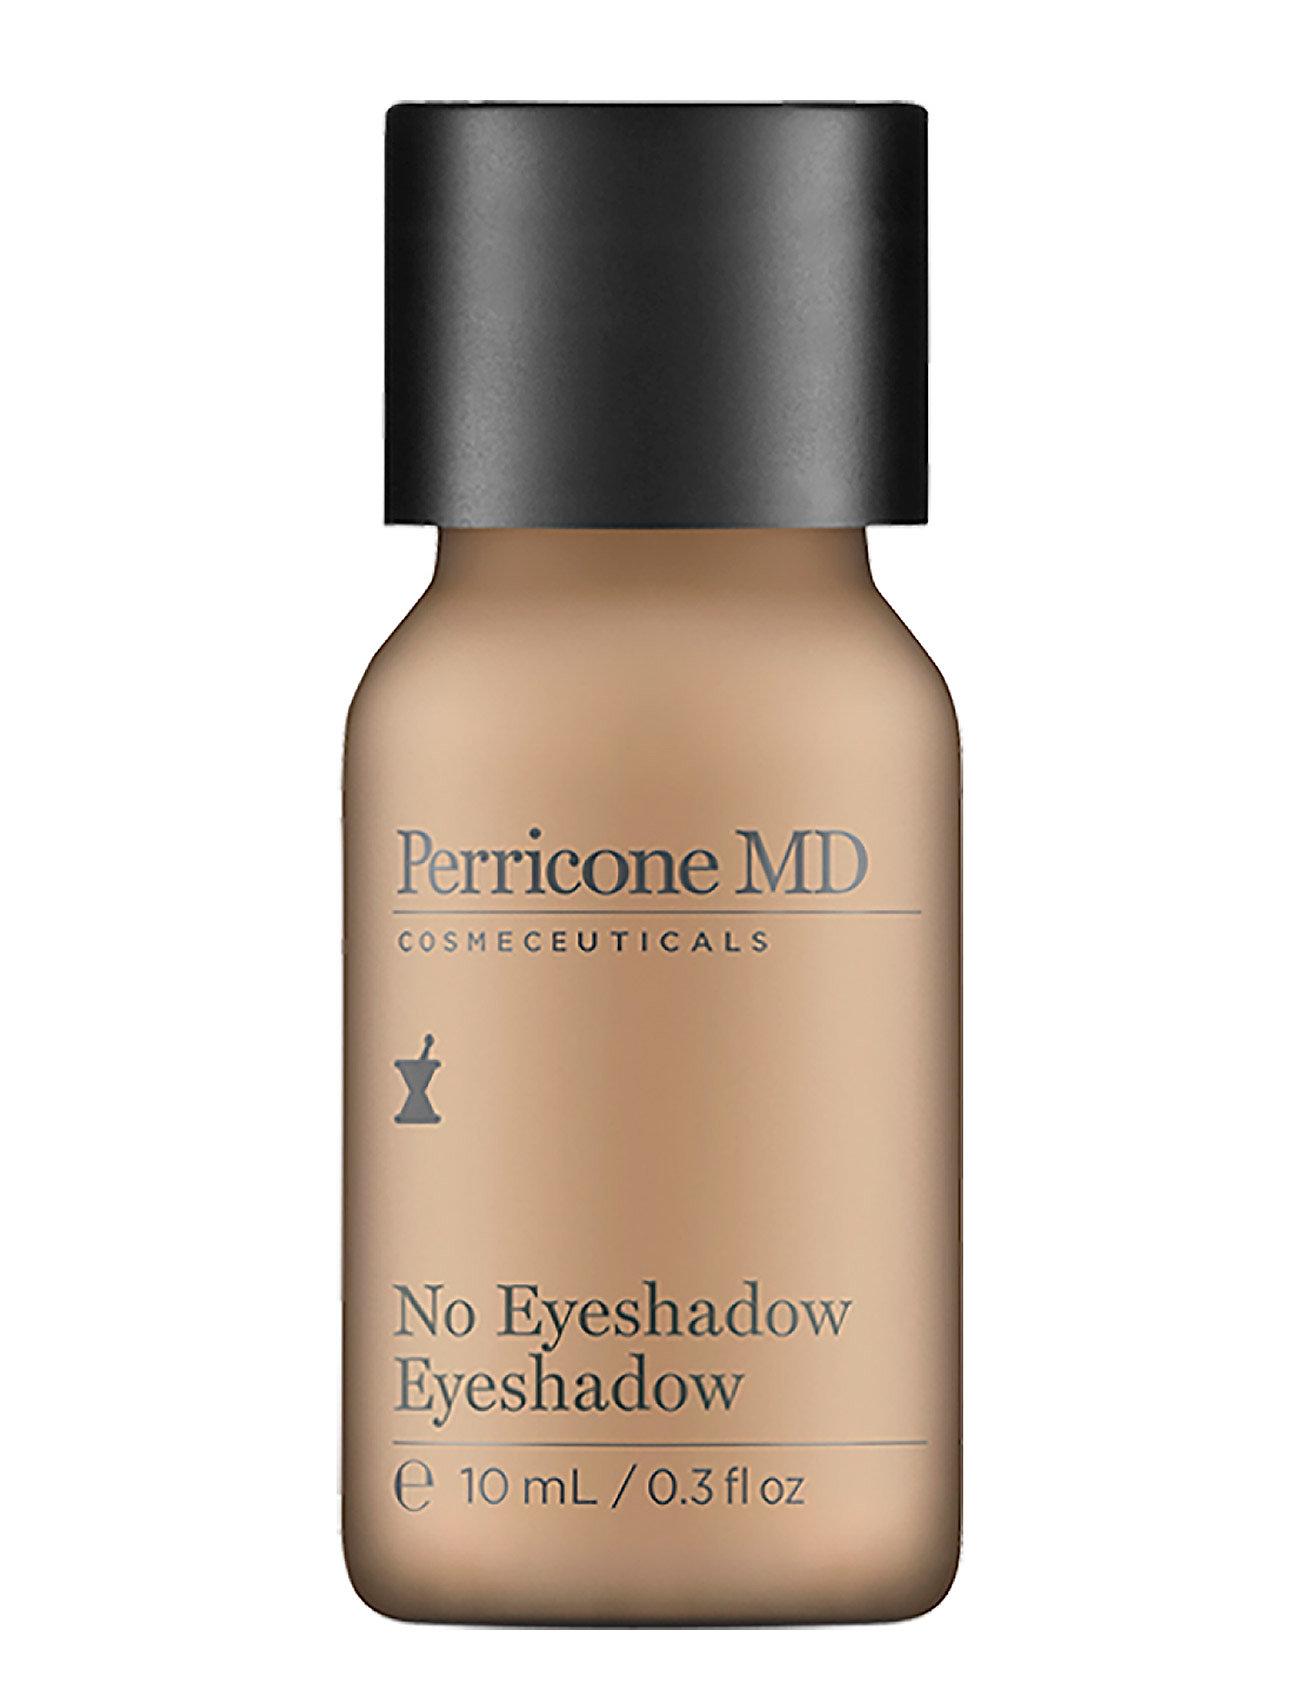 Image of No Eyeshadow Eyeshadow Beauty WOMEN Makeup Eyes Eyeshadows Eyeshadow - Not Palettes Creme Perric MD (3223838367)